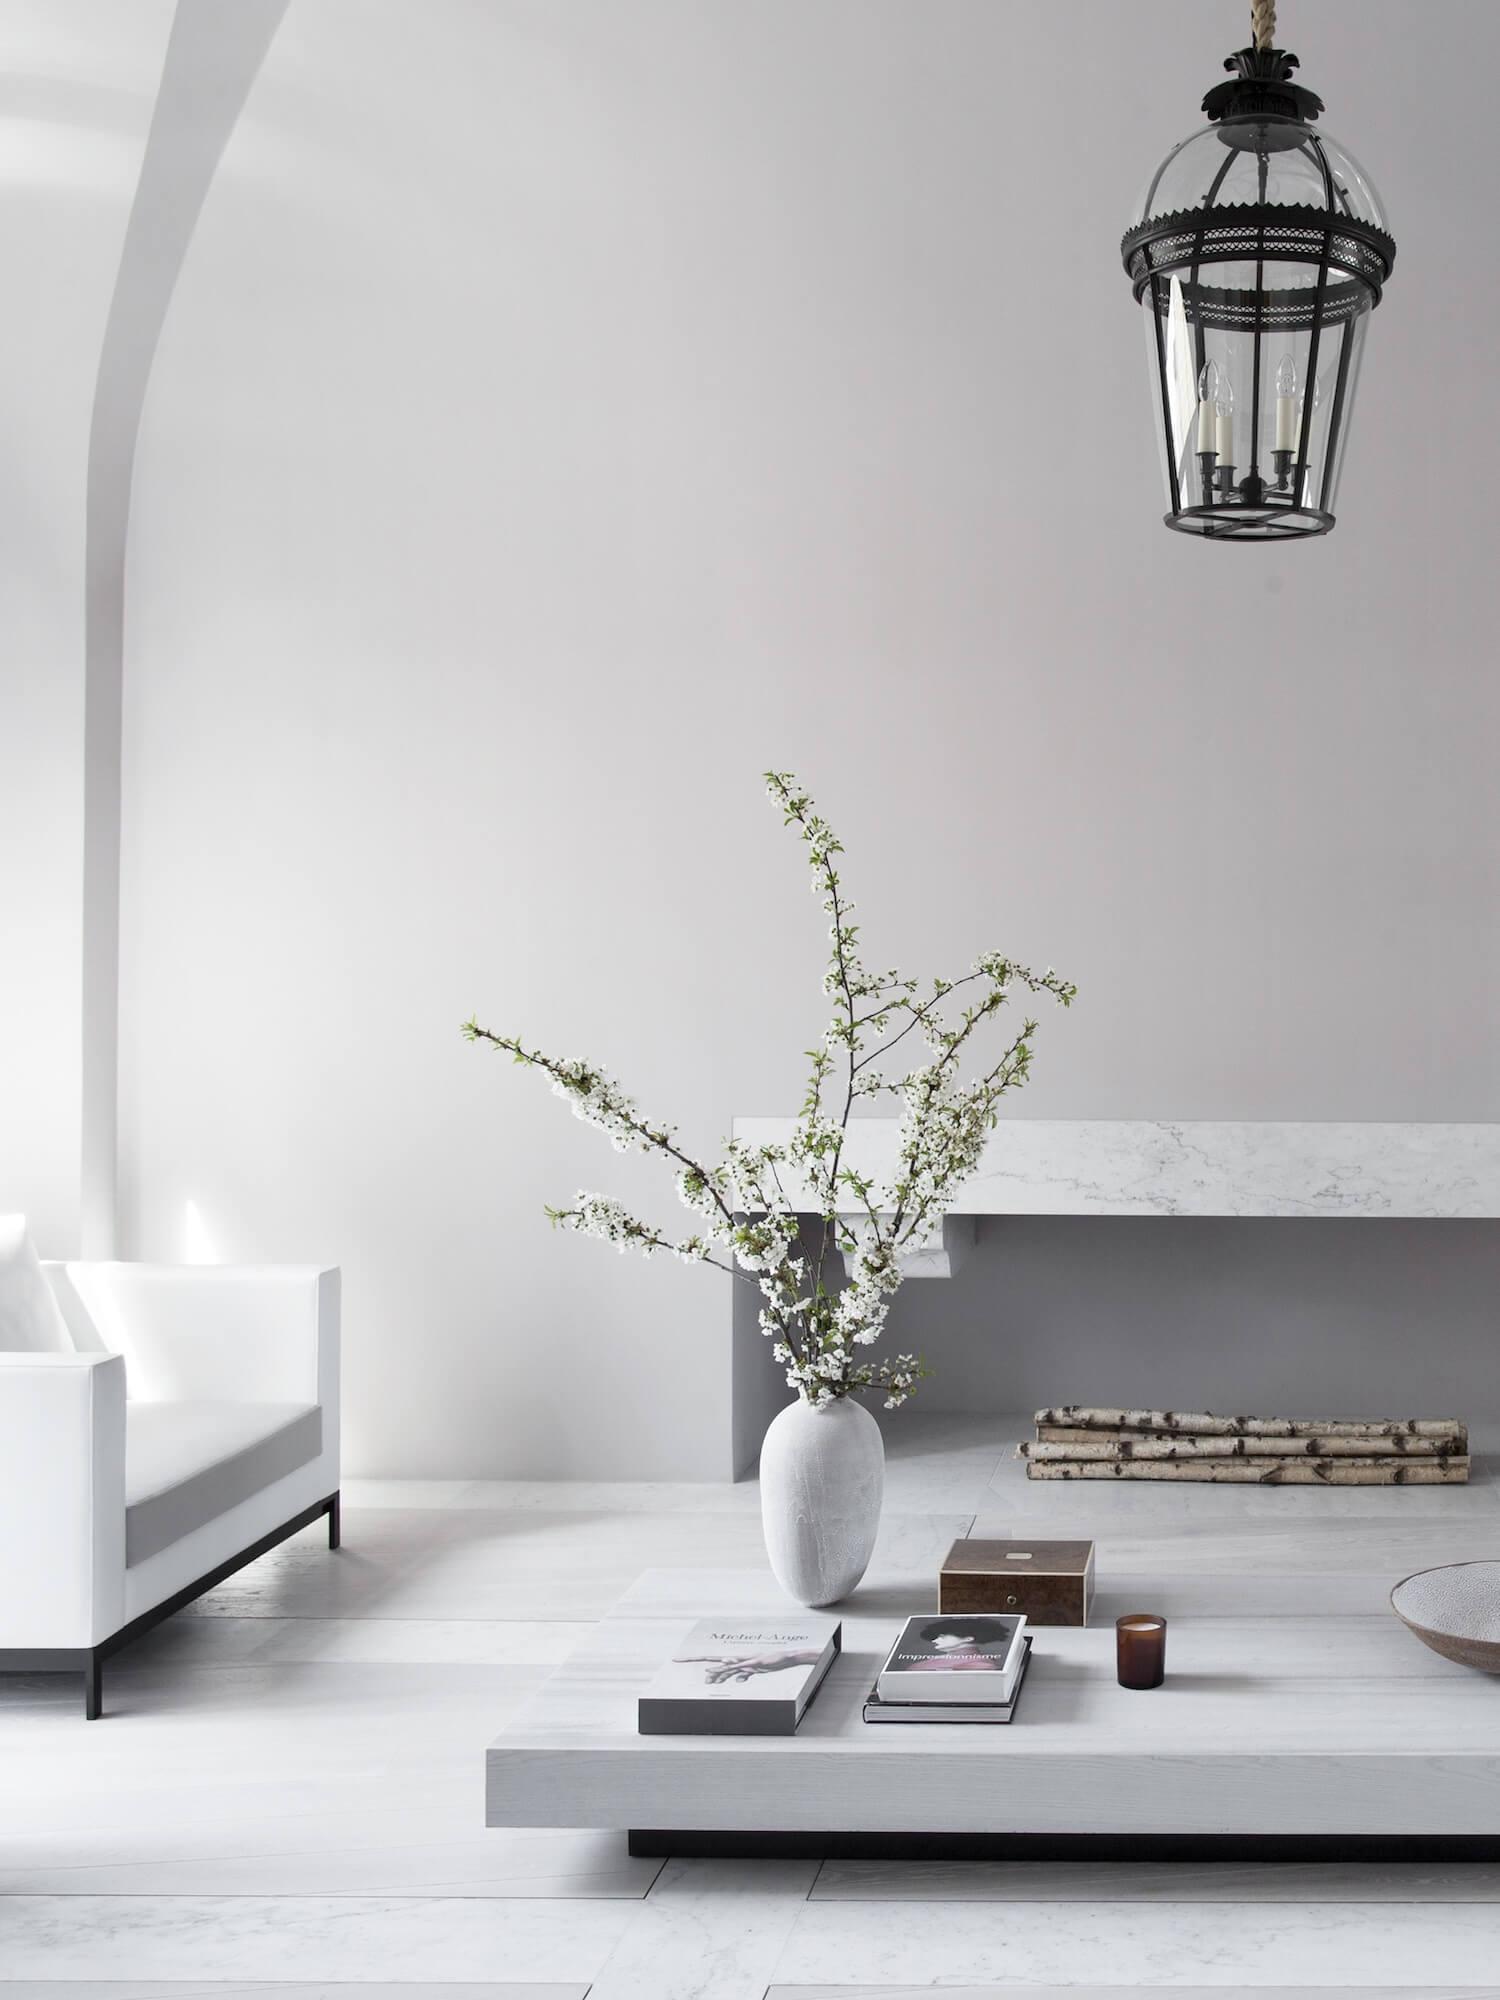 phong cách tối giản elledecoration vietnam-paris-apartment-guillaume-alan3